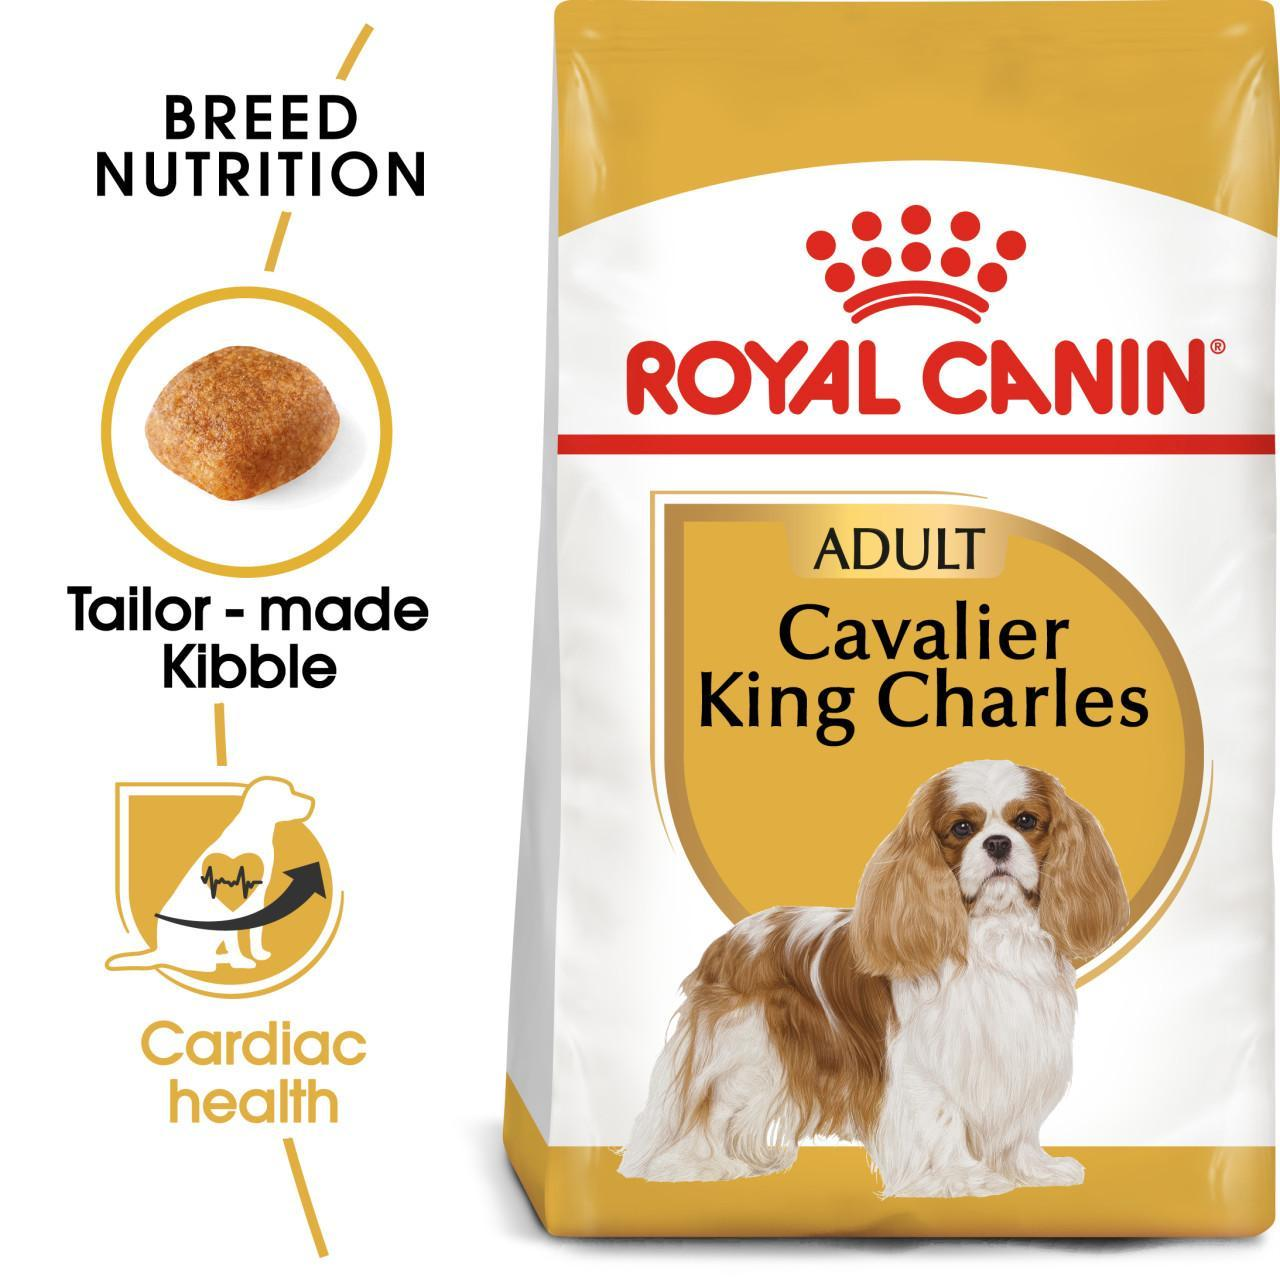 An image of Royal Canin Cavalier King Charles Spaniel